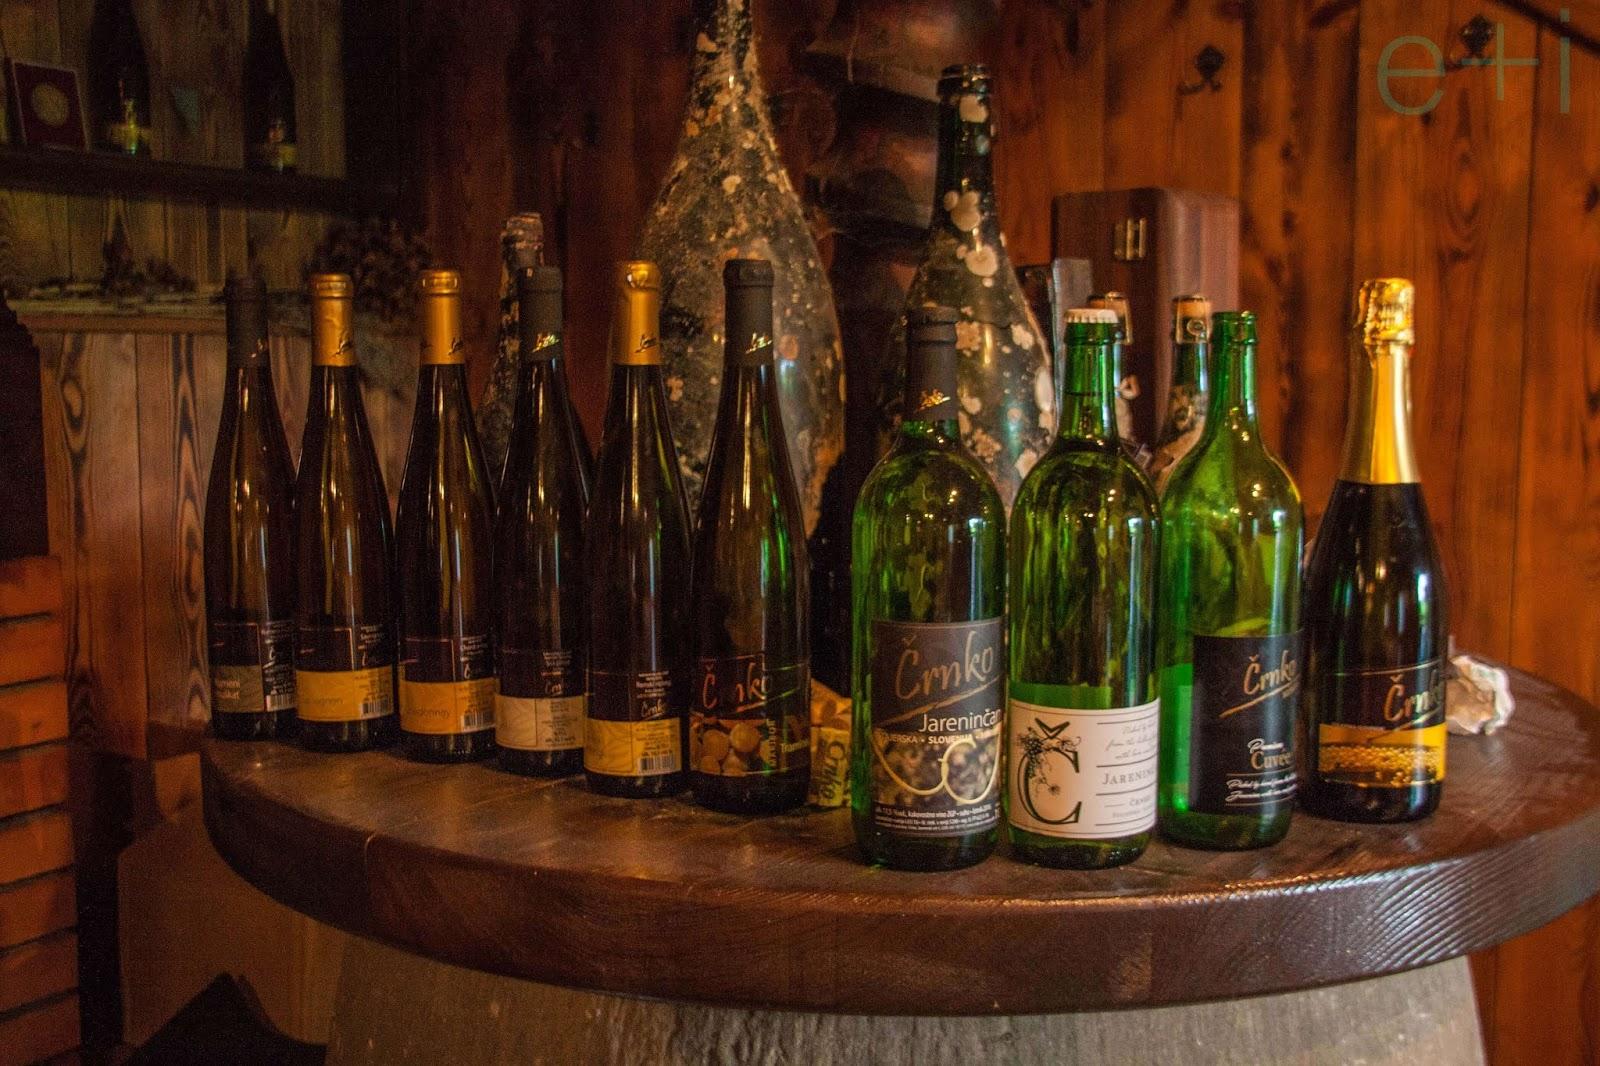 Los vinos Črnko